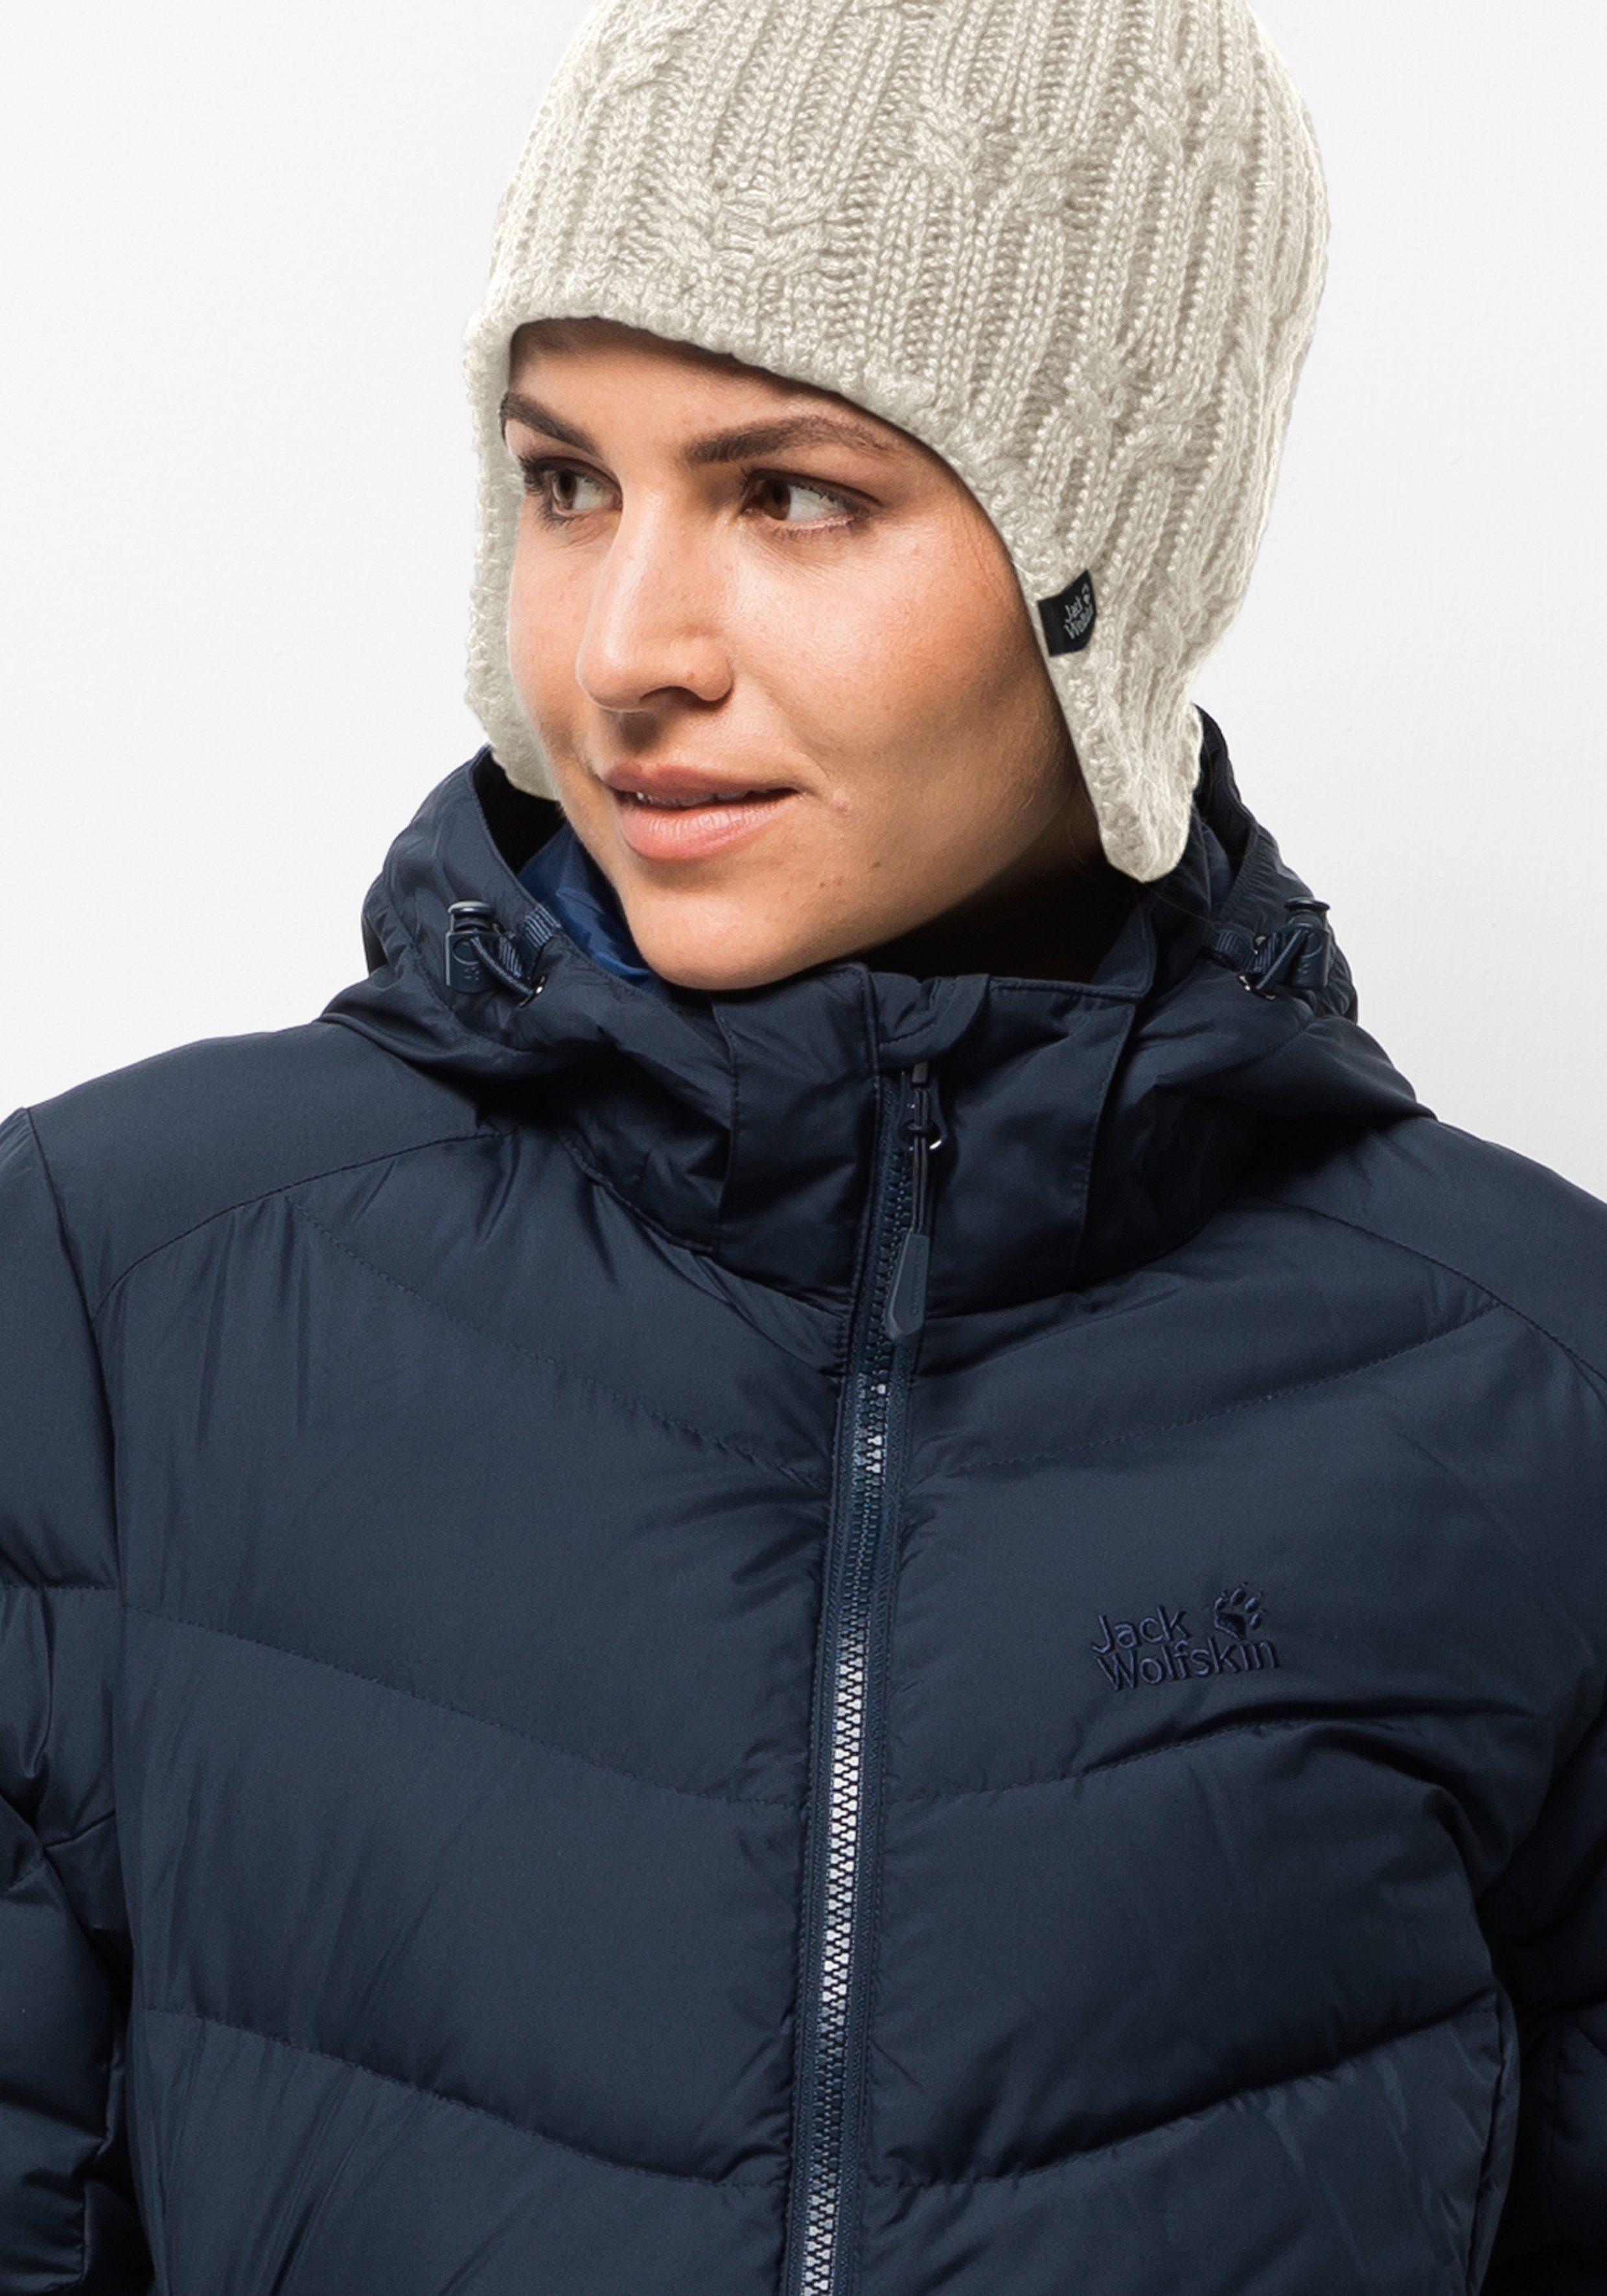 hot sale online cheap prices sells Jack Wolfskin Bommelmütze »STORMLOCK BRAID CAP WOMEN« bestellen | BAUR